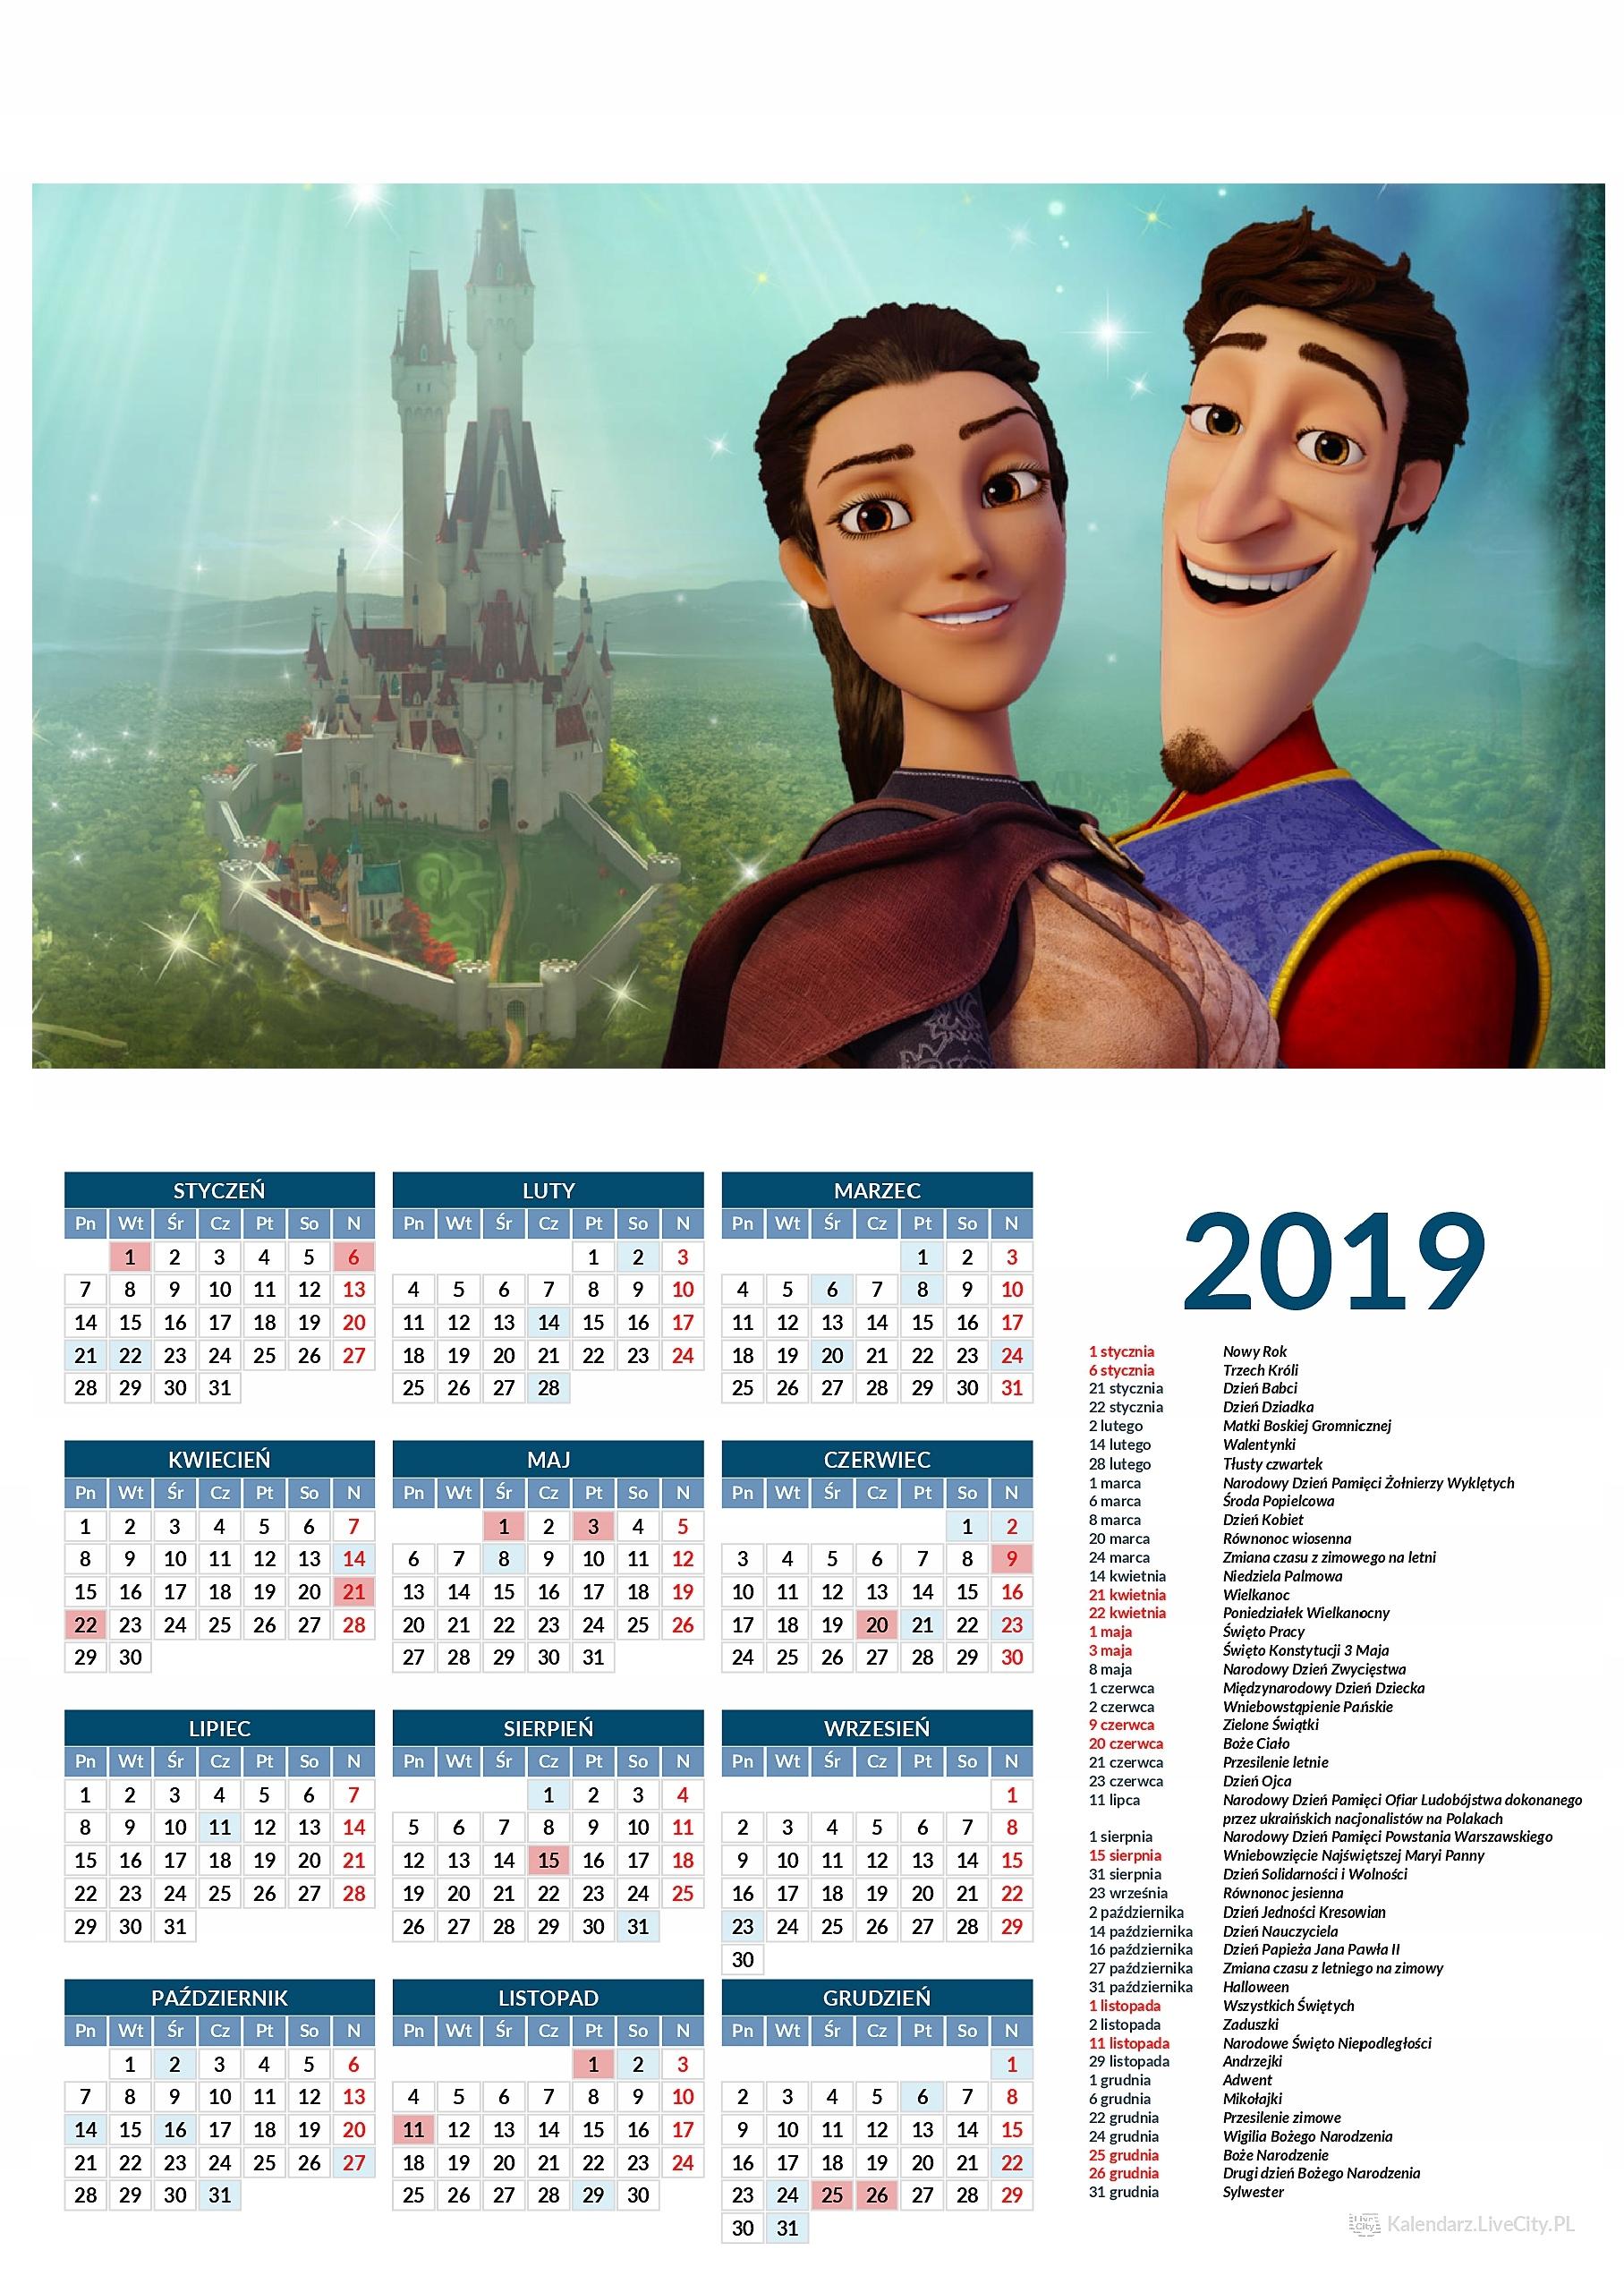 Kalendarz 2019 film Książę Czaruś